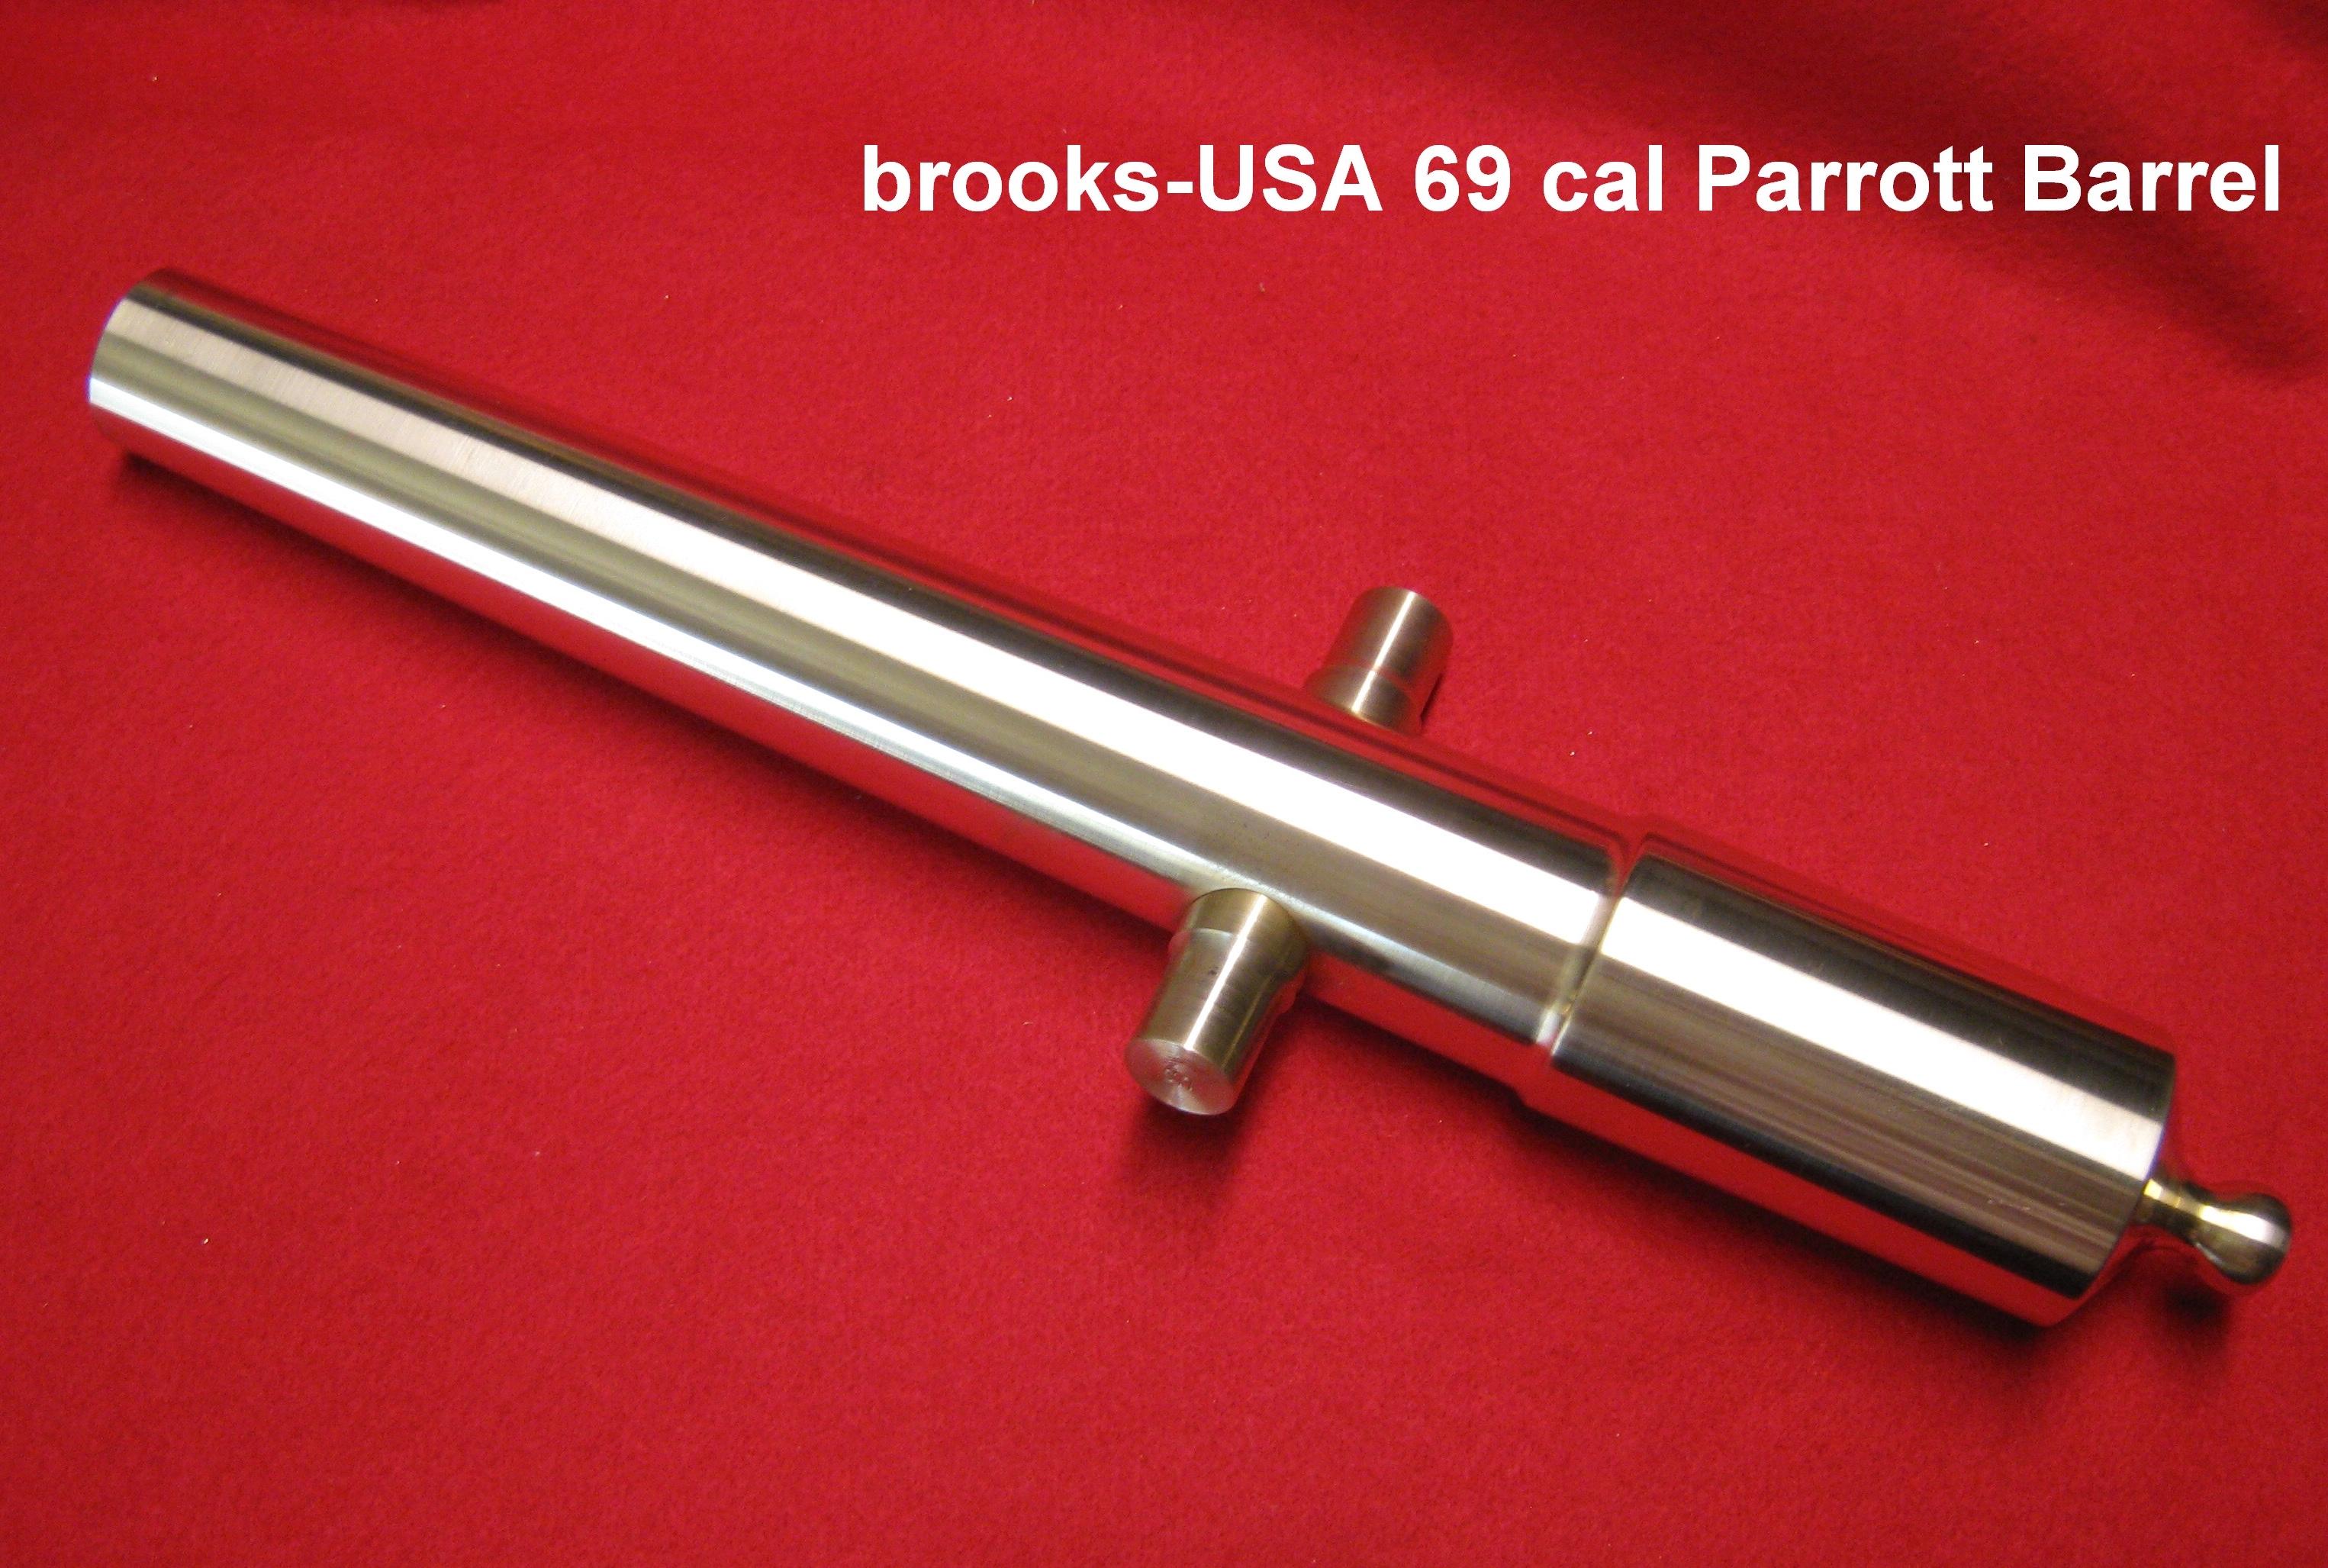 BROOKS Parrott